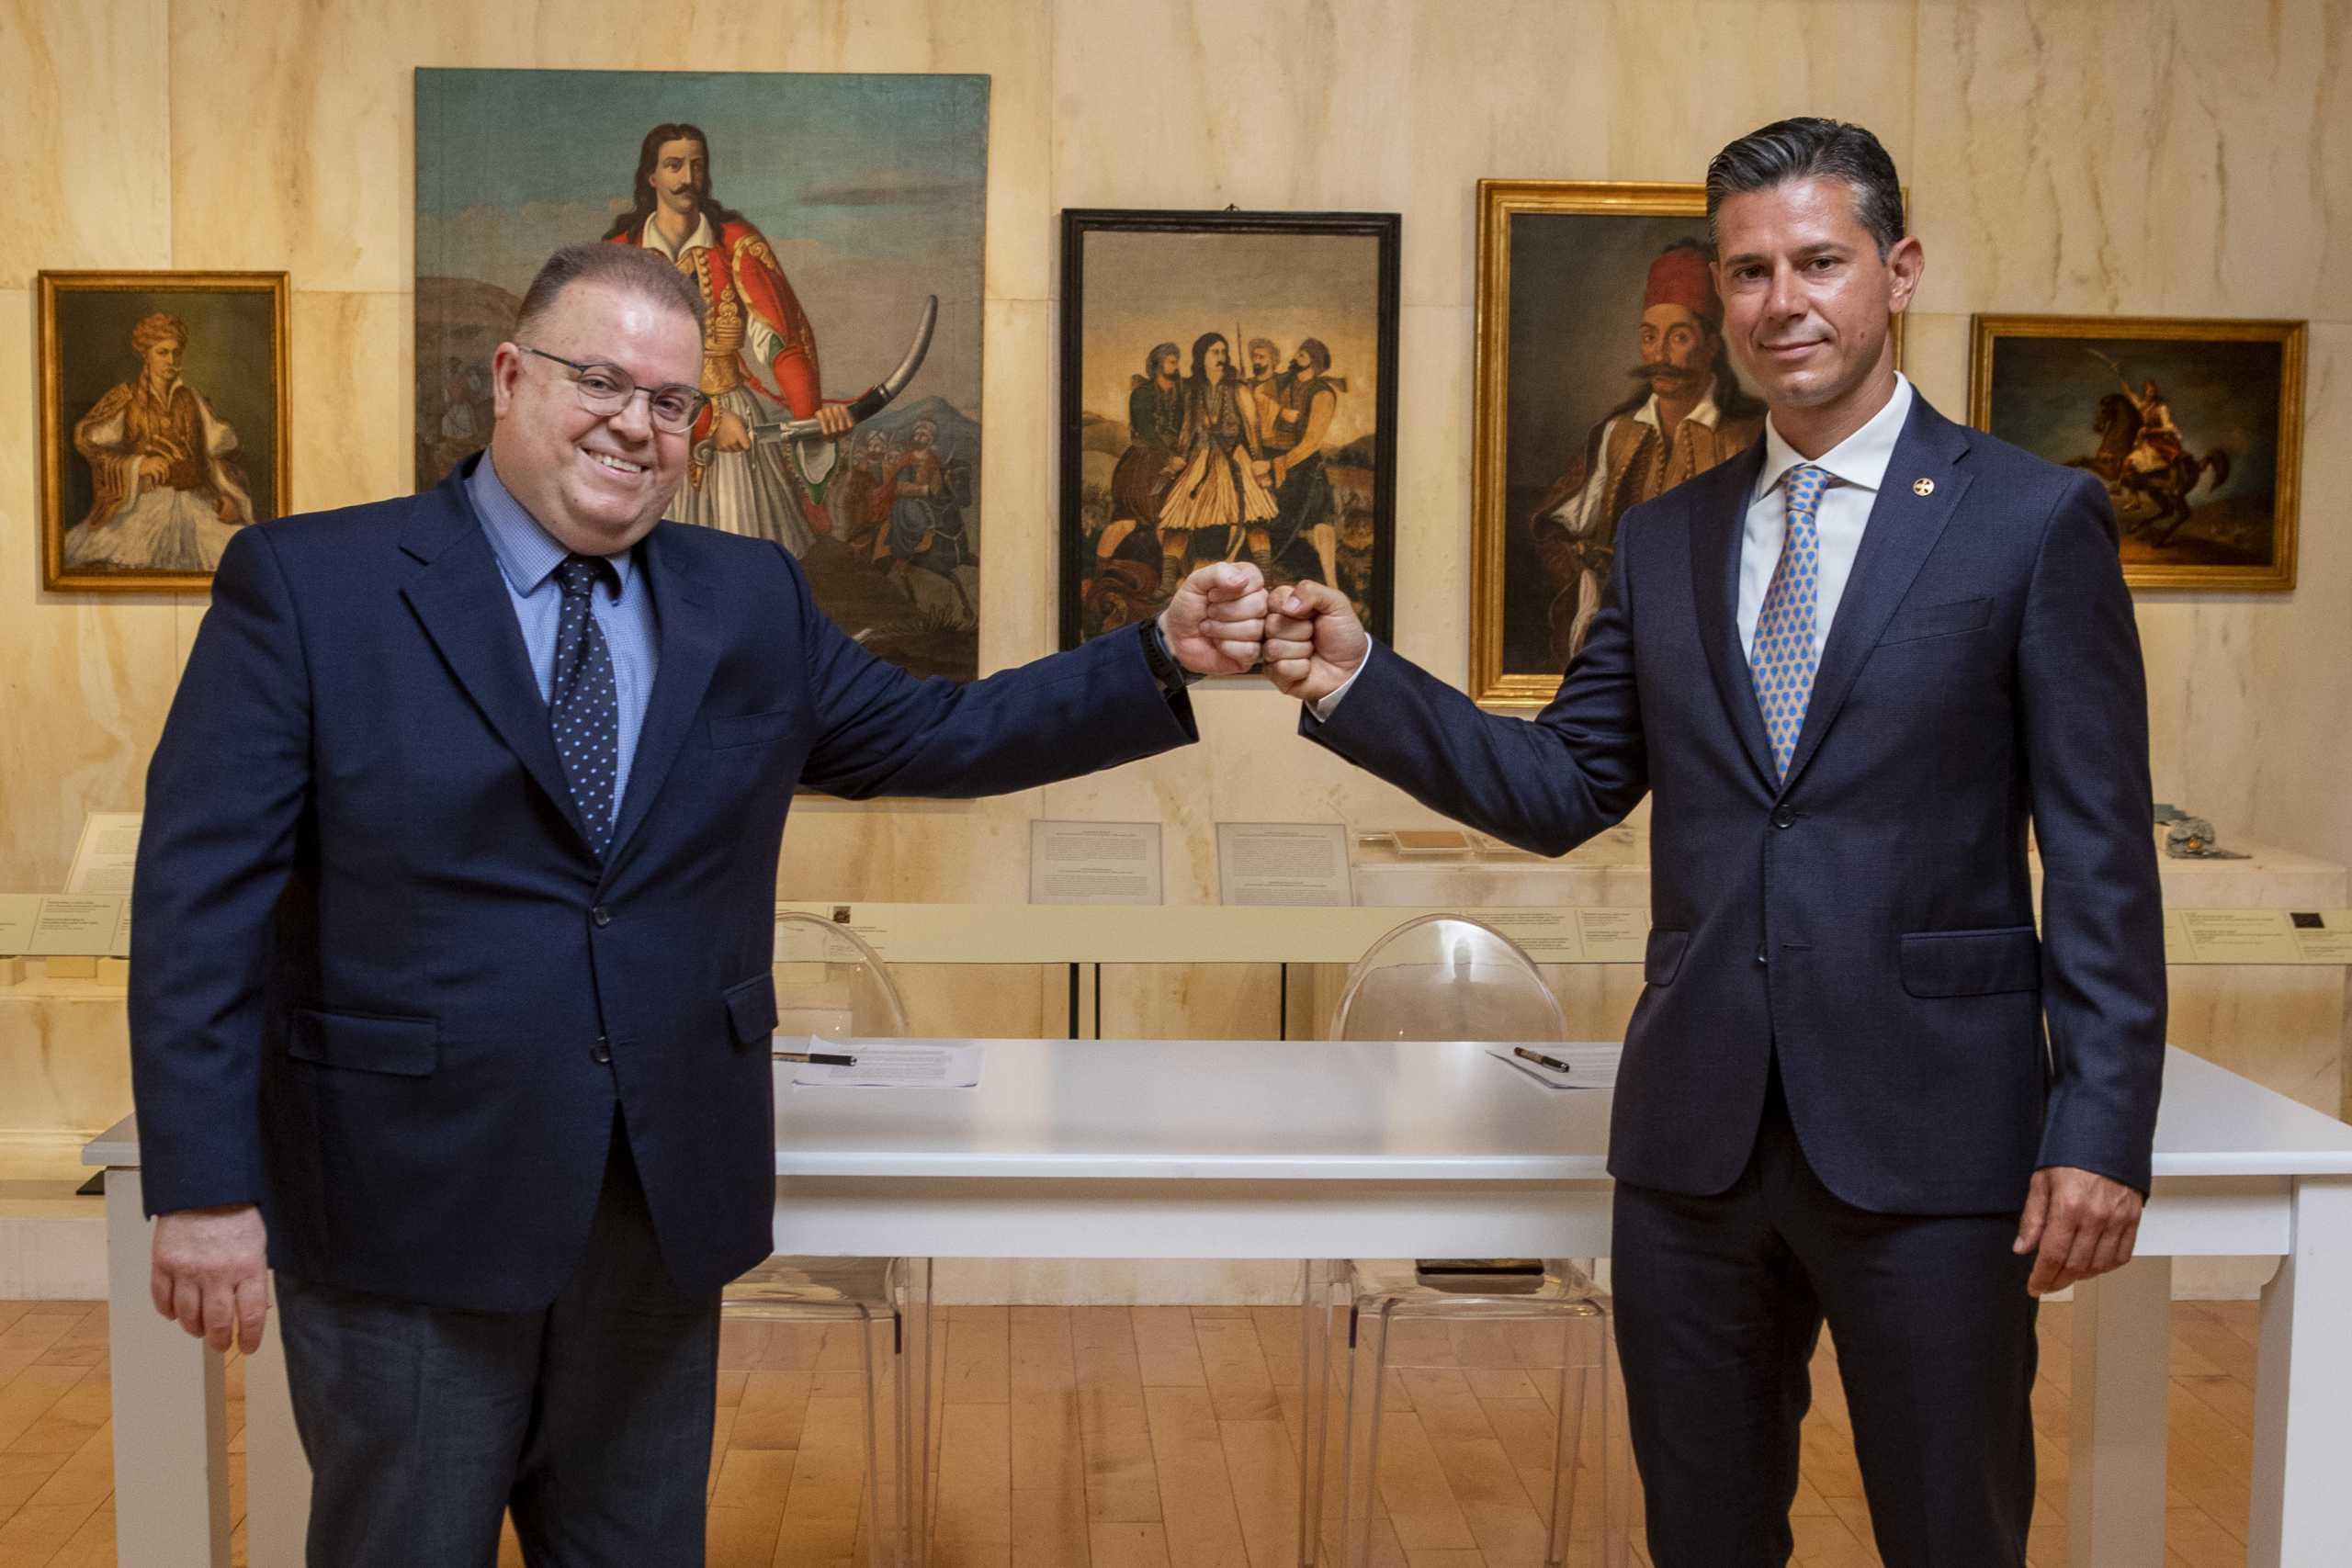 WIND:  Στρατηγική συνεργασία με Μουσείο Μπενάκη για τη δημιουργία του πρώτου 5G Μουσείου